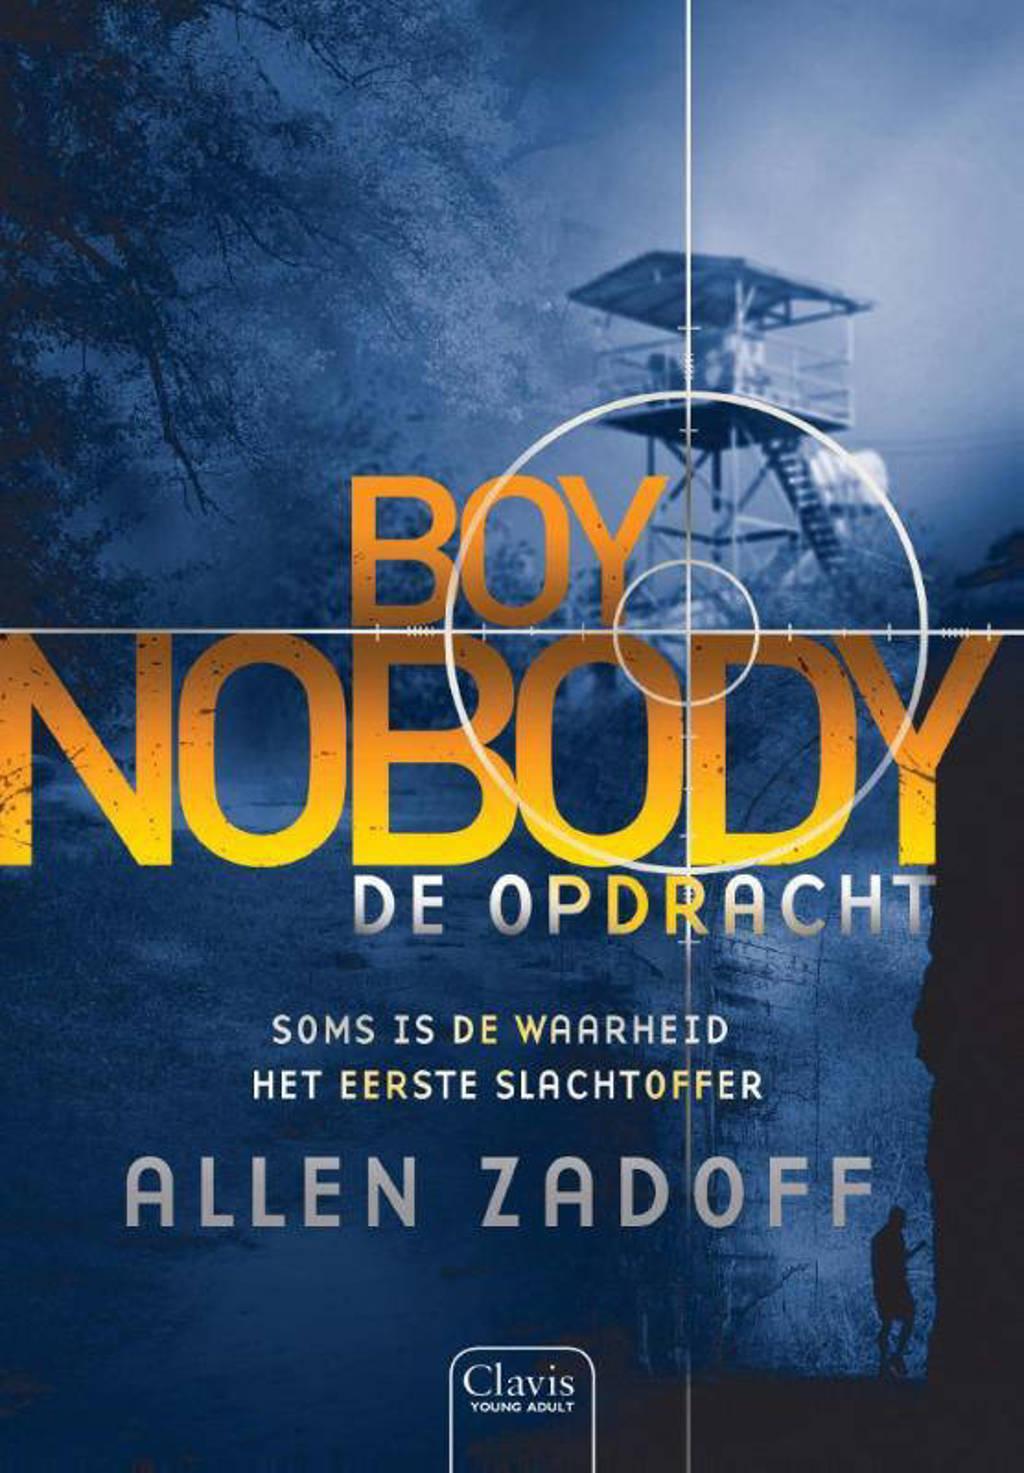 Boy nobody: De opdracht - Allen Zadoff